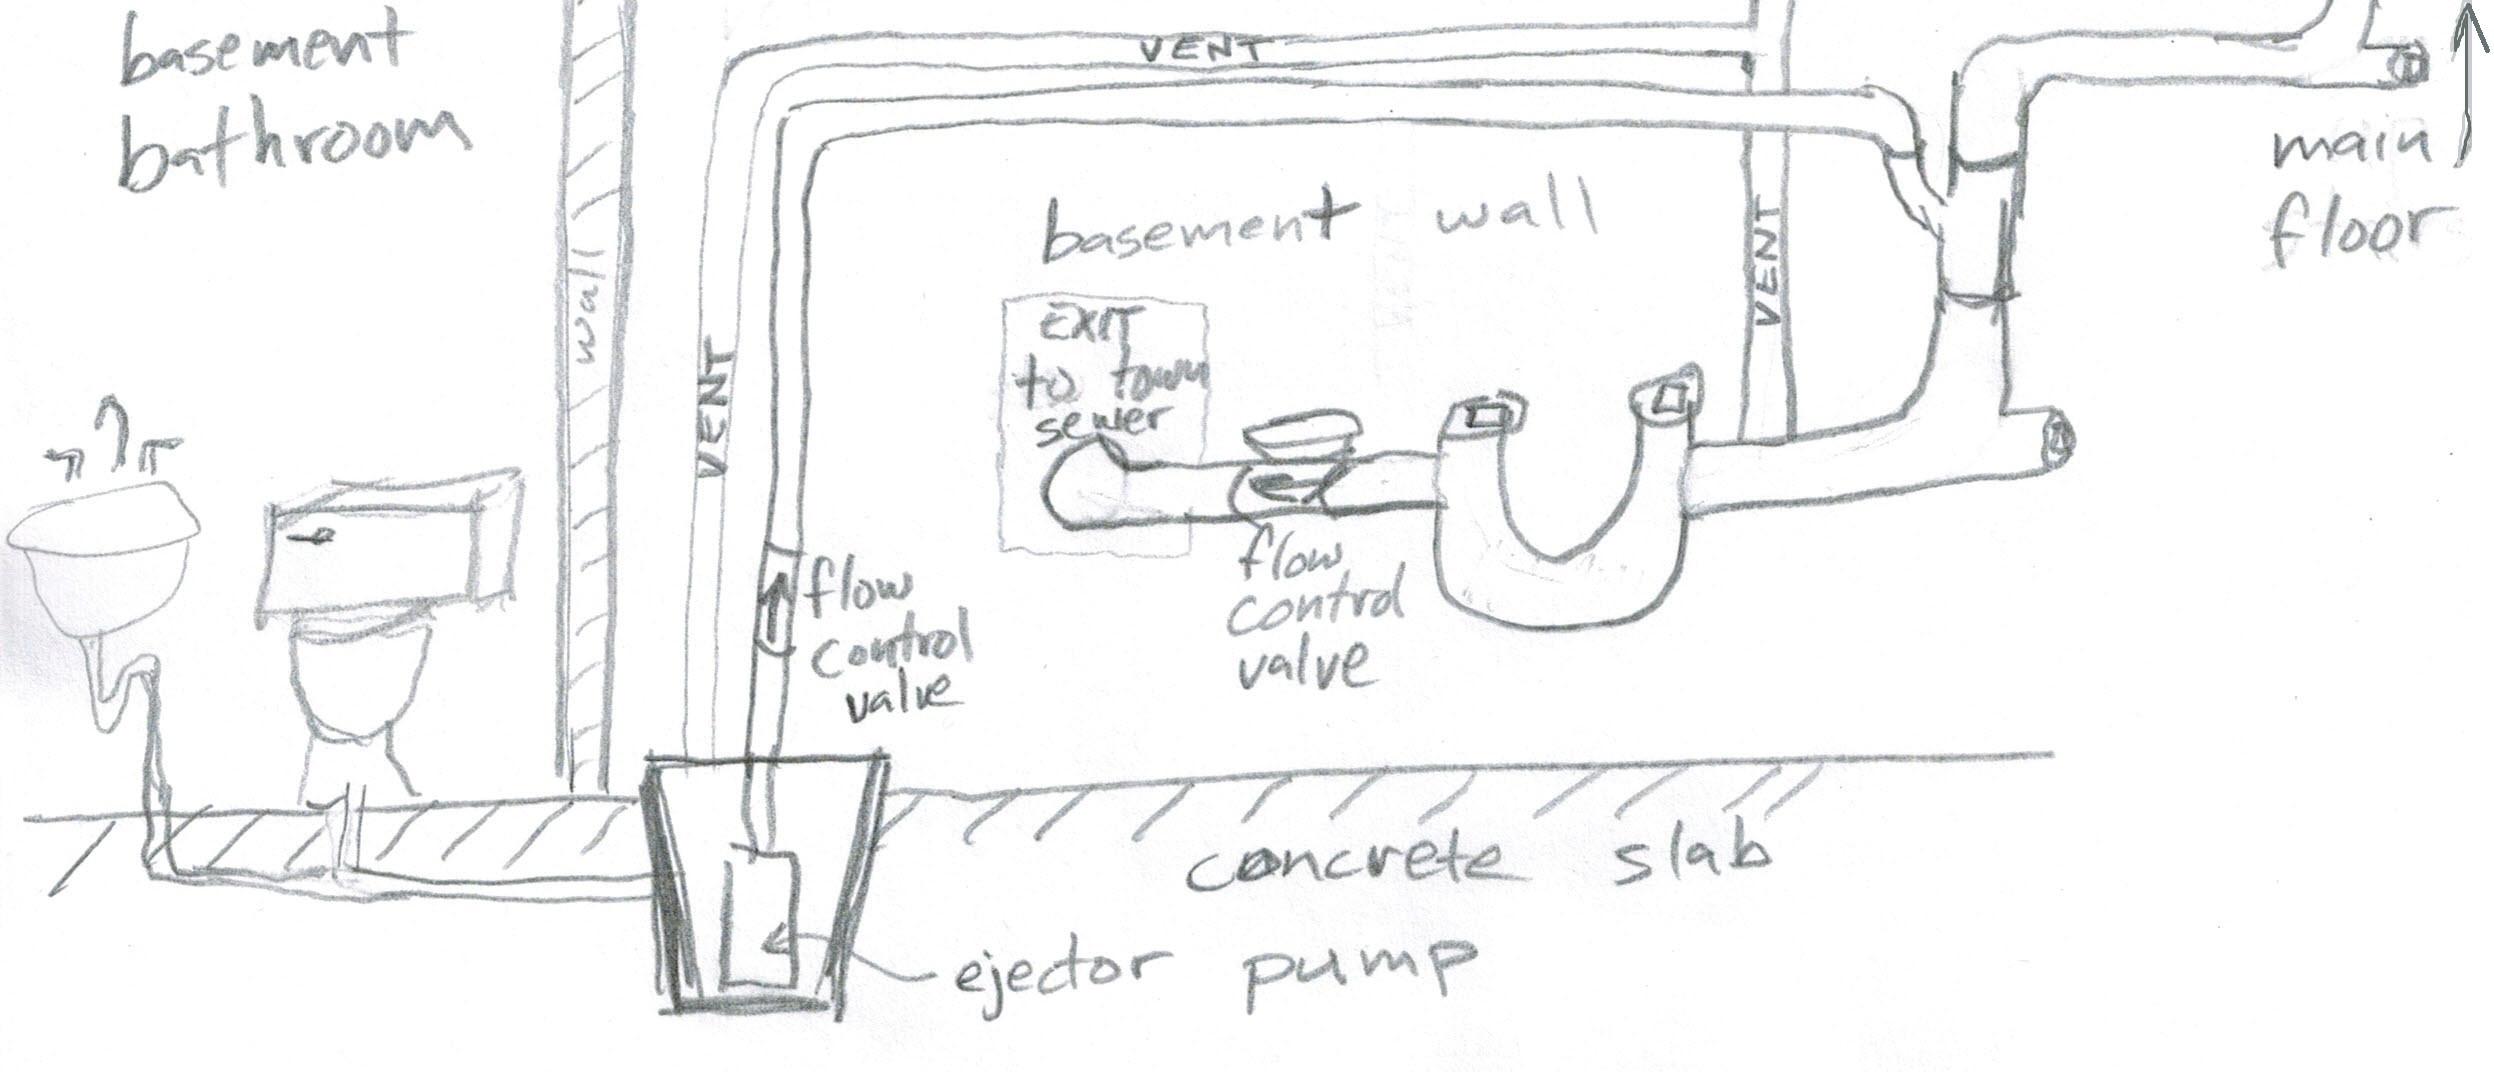 Sewage Ejector Pump For Basement Bathroom2494 X 1072